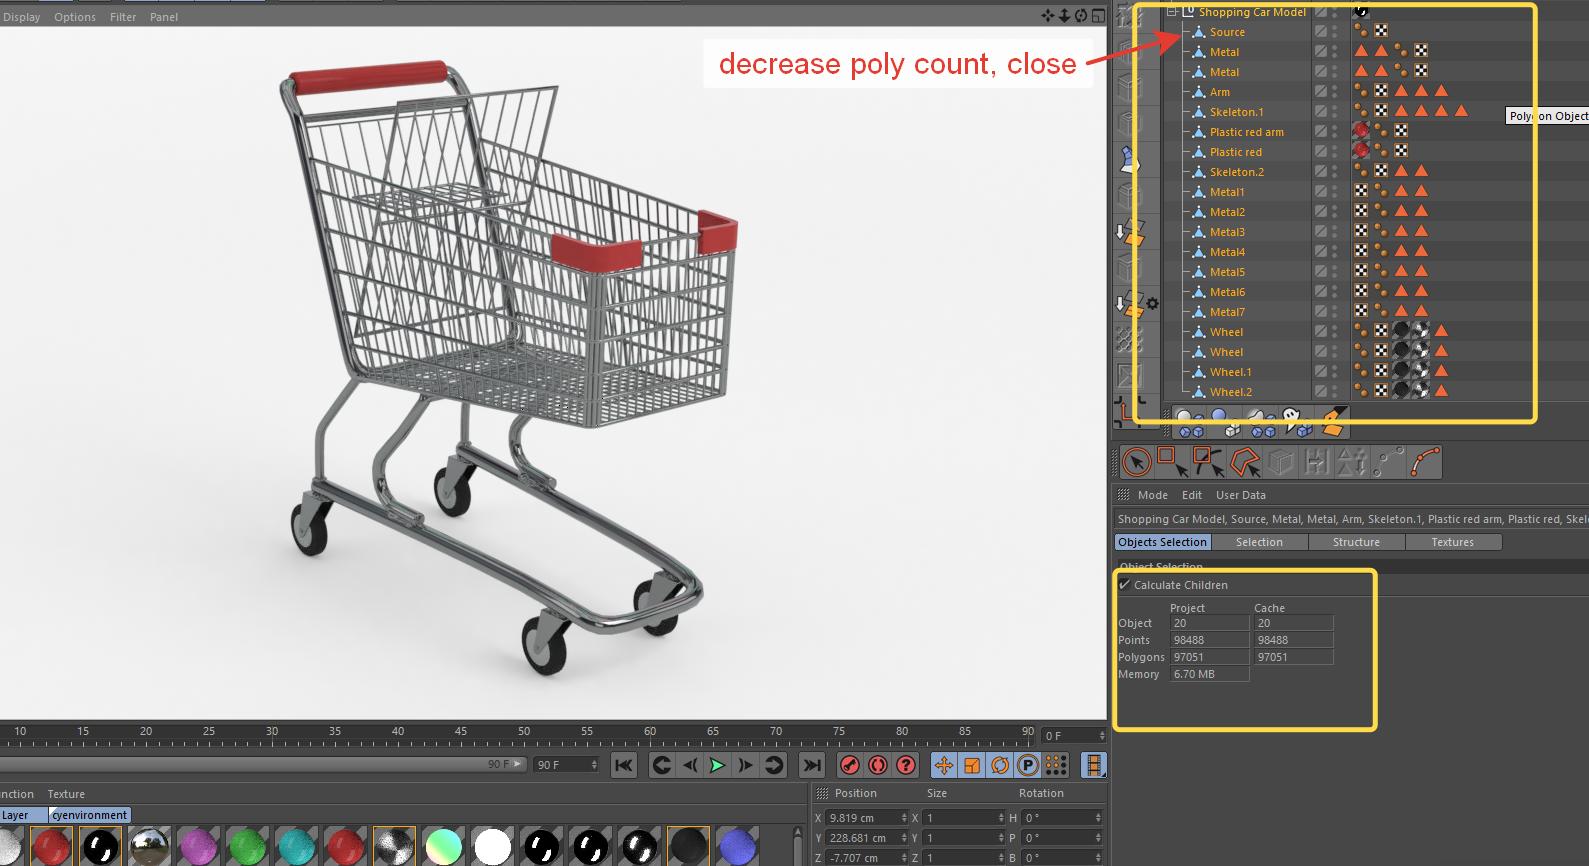 Shopping Cart Model